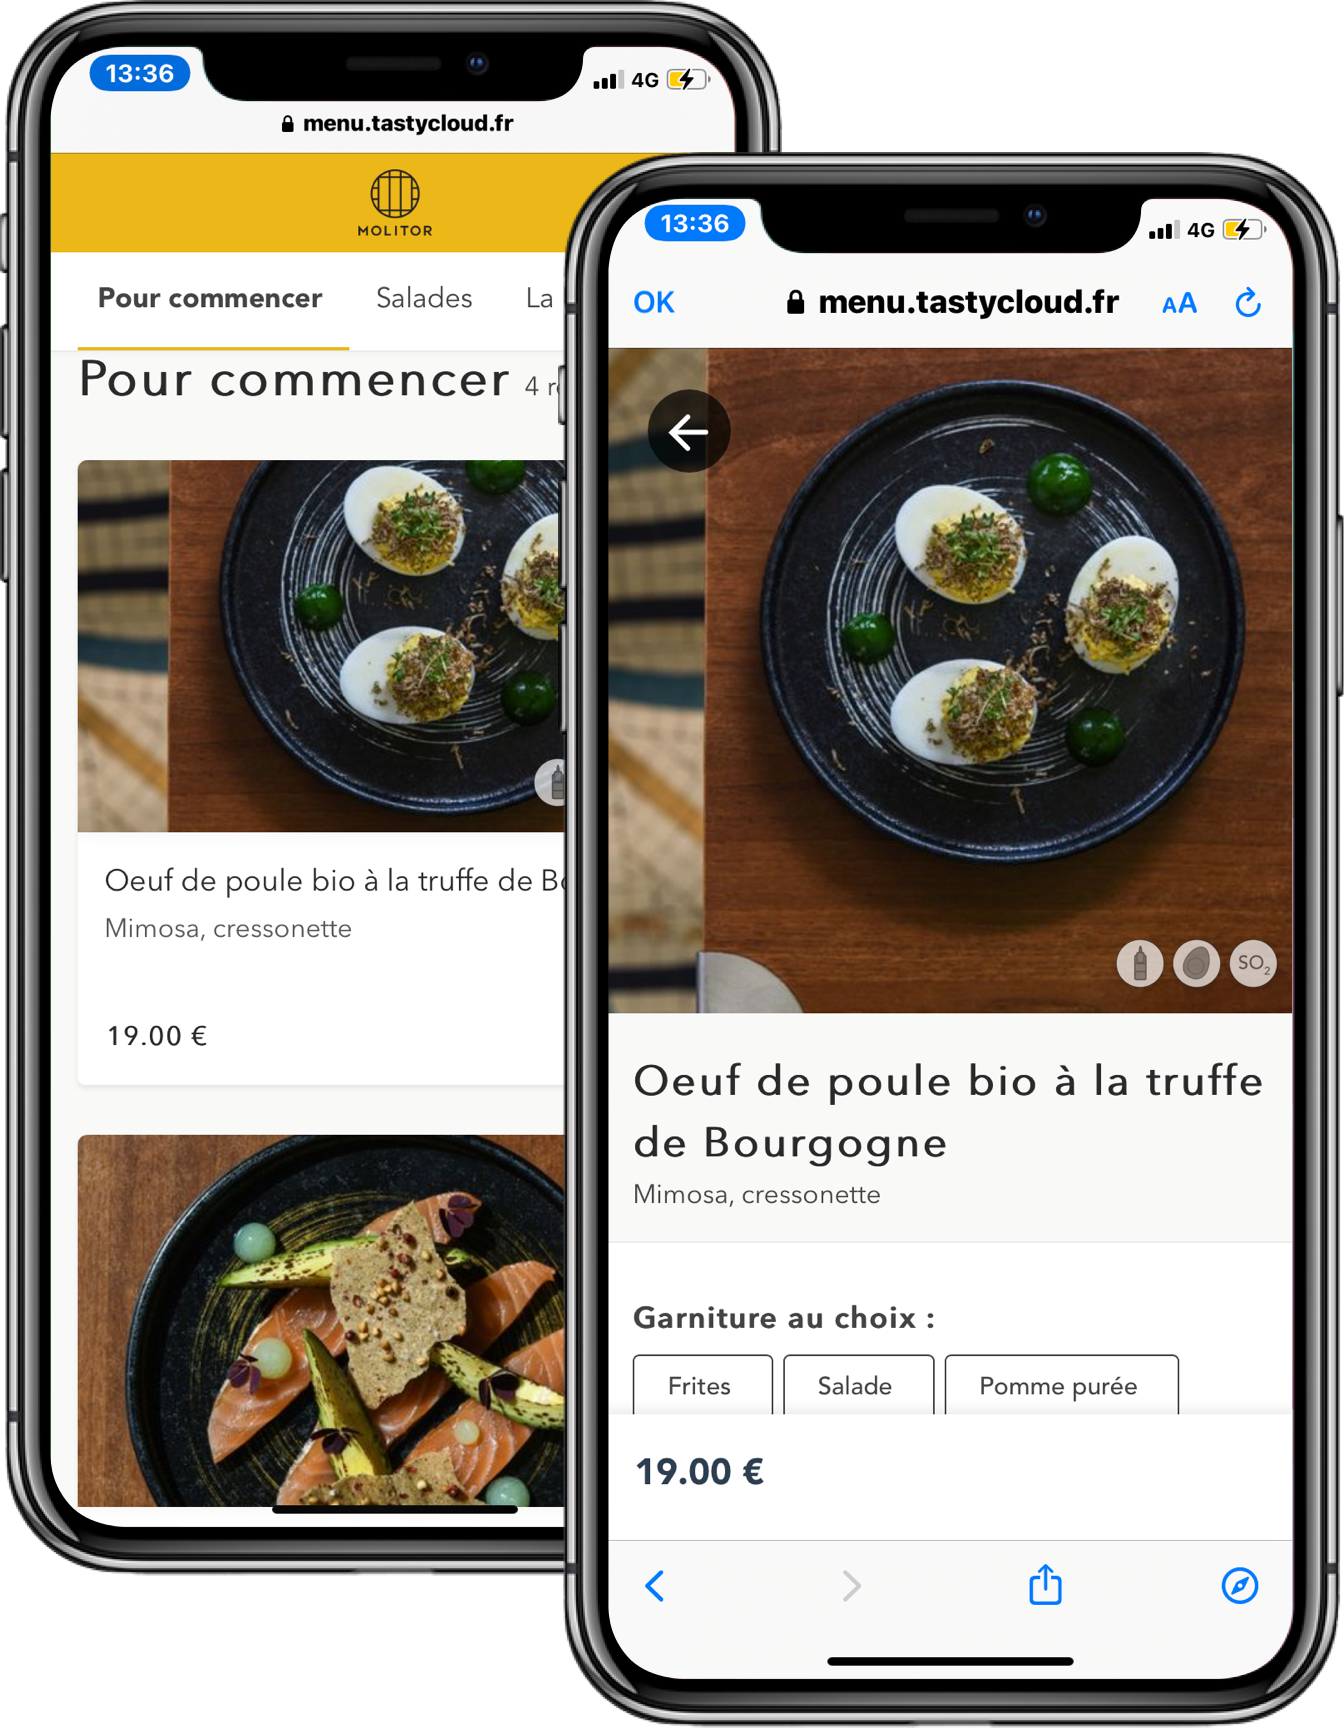 vente-a-emporter-restaurant-gratuit